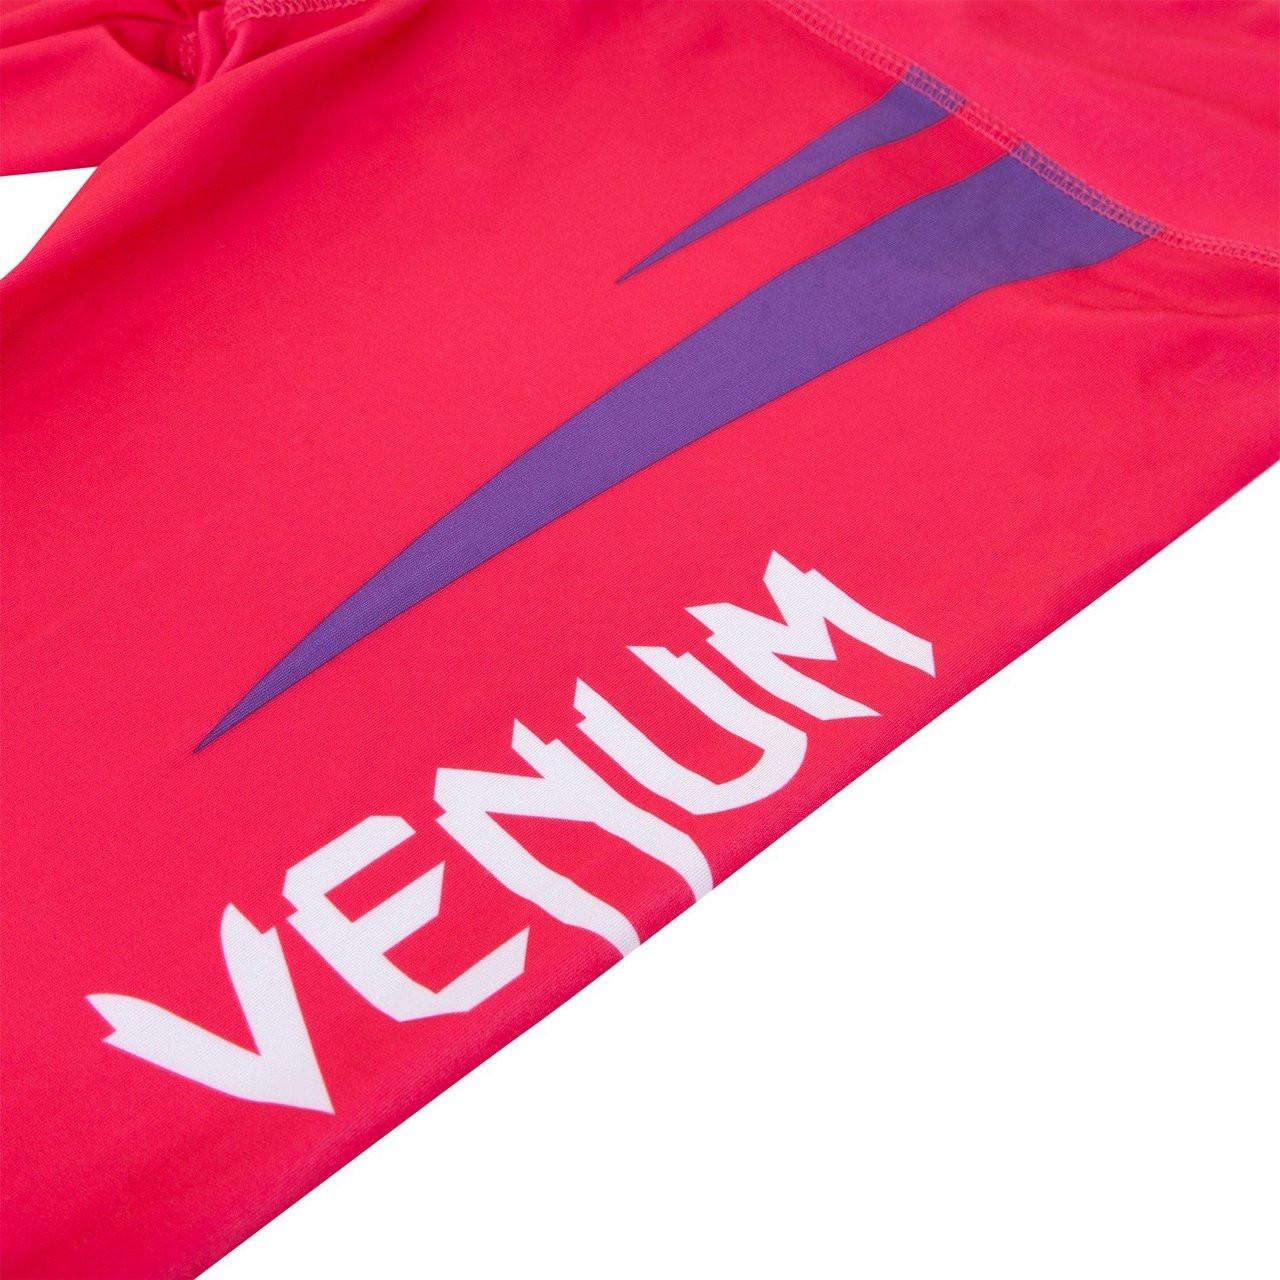 Venum Body Fit Leggings available at www.thejiujitsushop.com   Enjoy Free Shipping from The Jiu Jitsu Shop today!